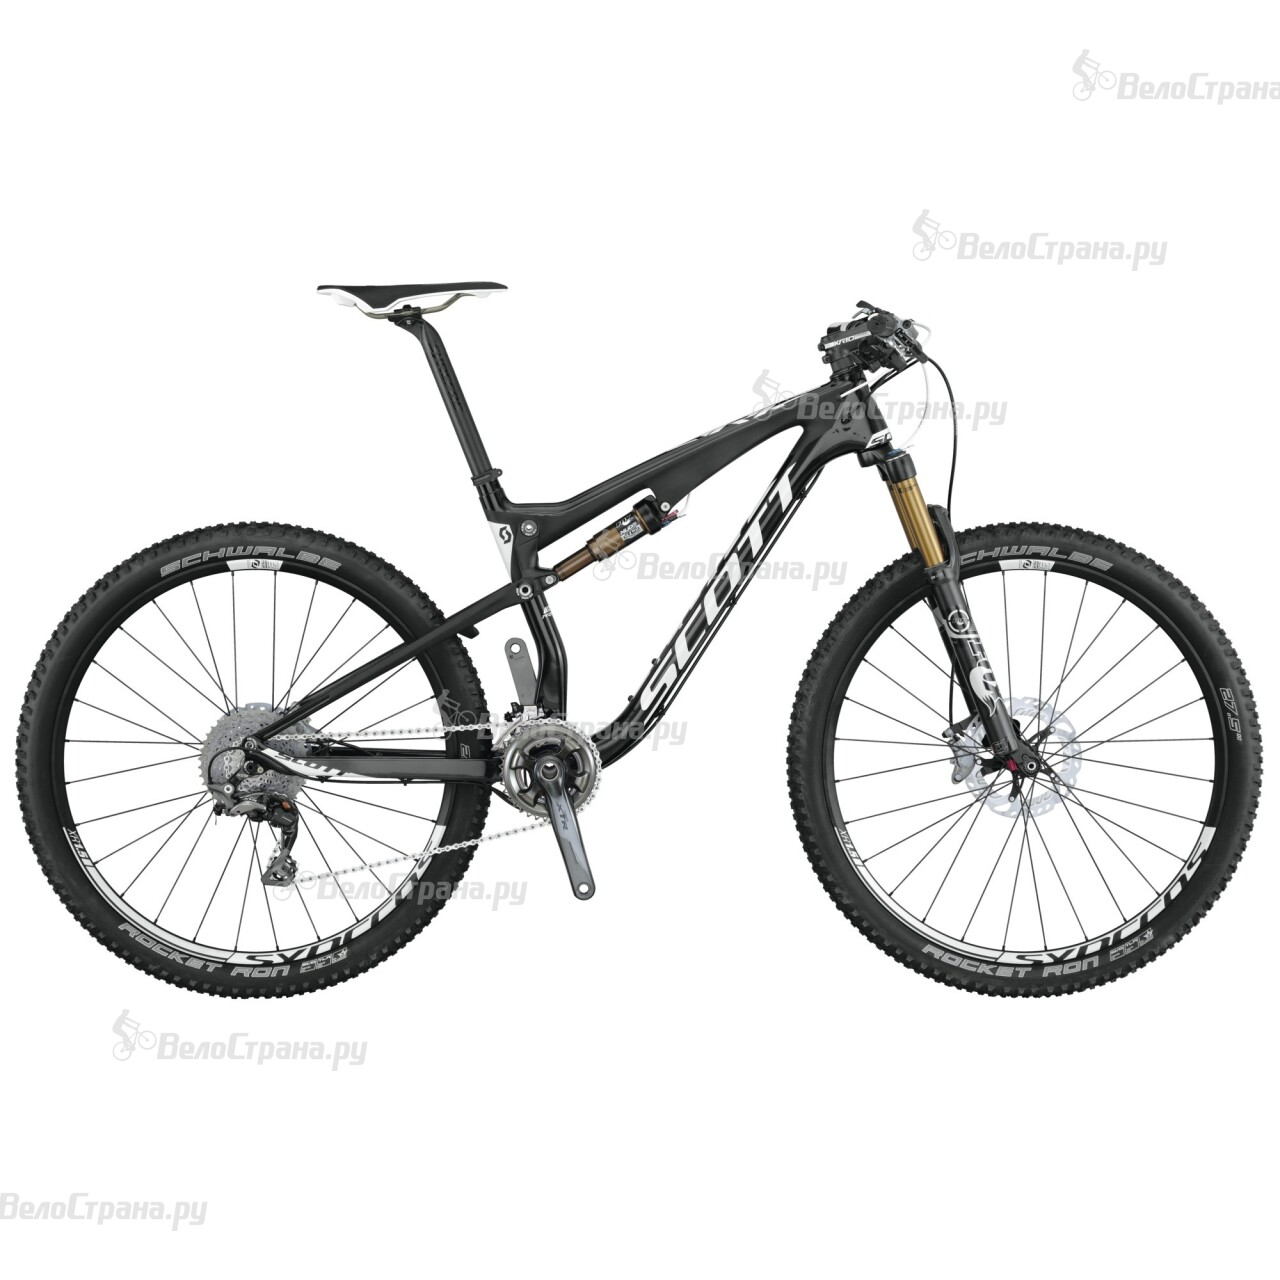 Велосипед Scott Spark 700 Premium (2015) велосипед scott spark 700 premium 2015